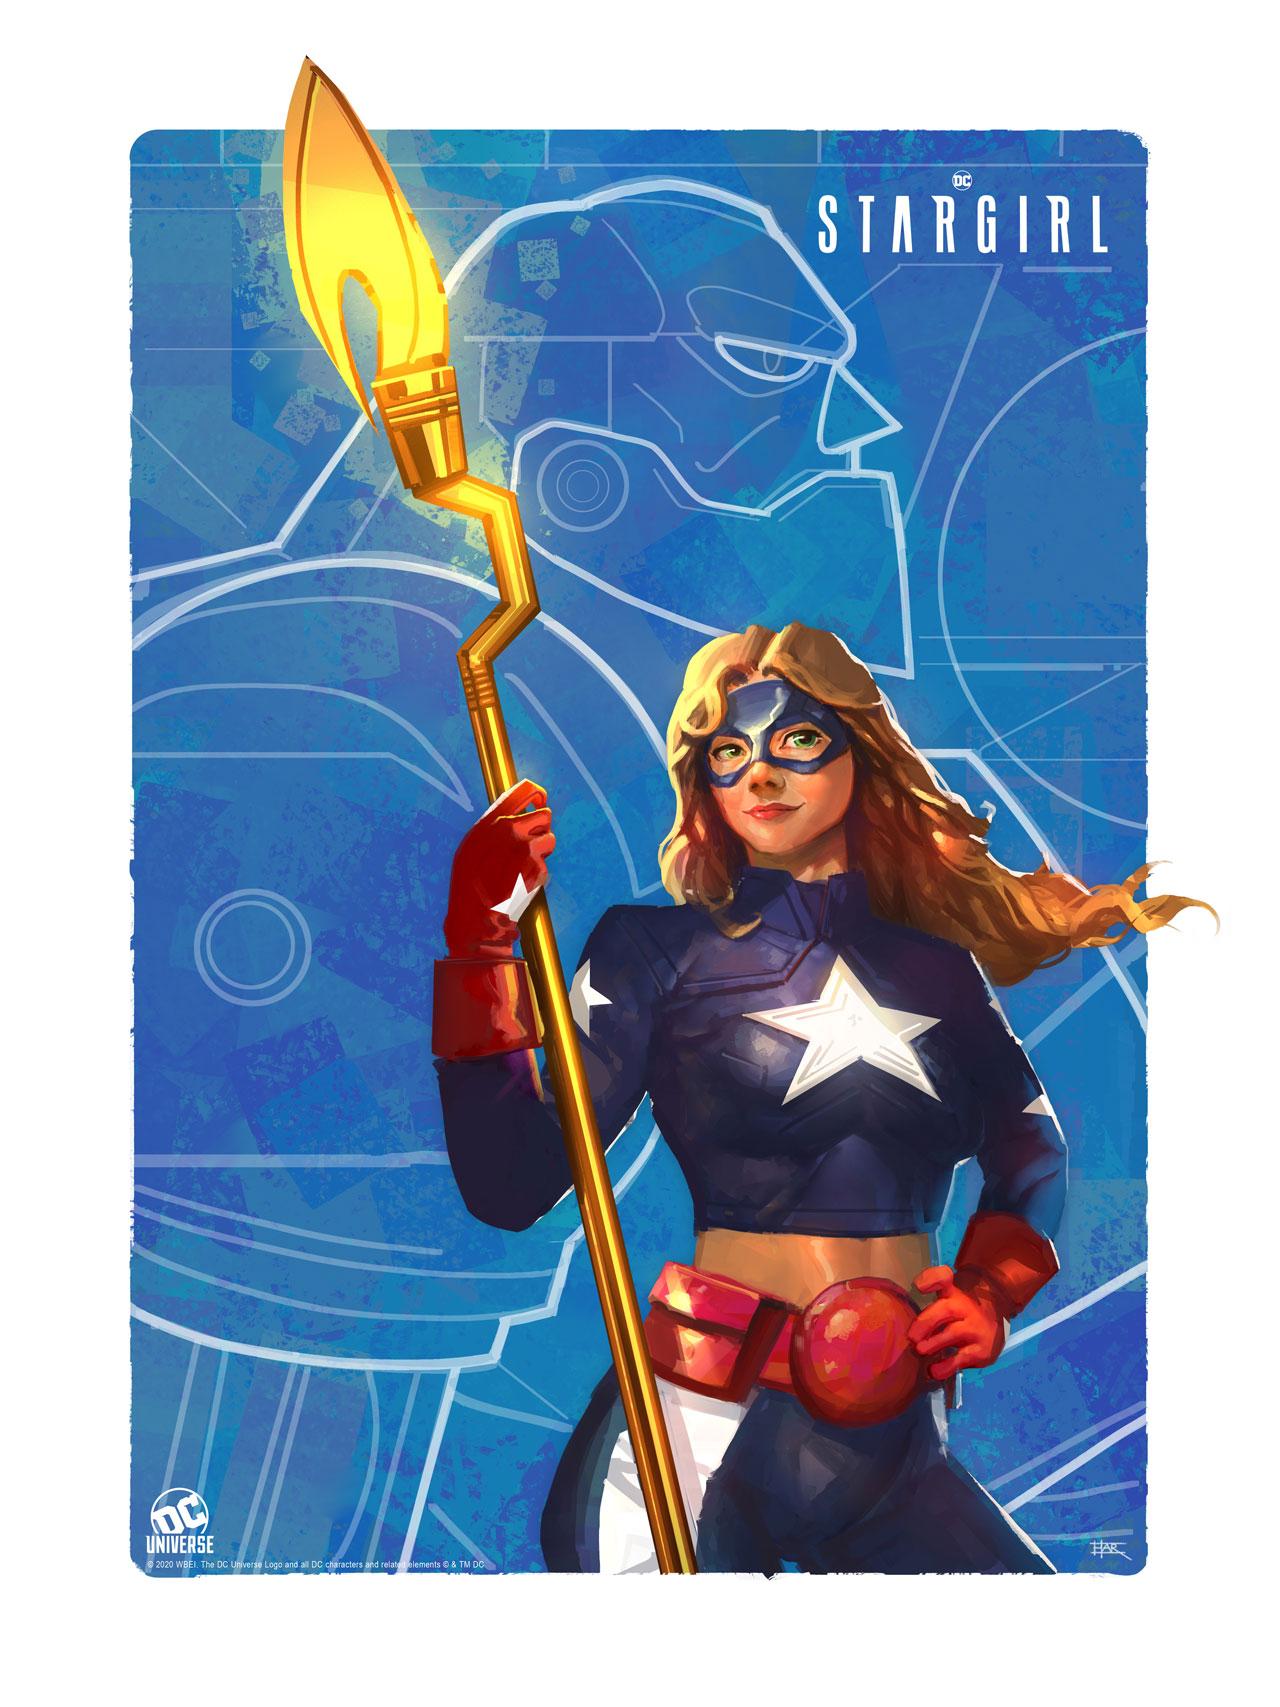 stargirl-poster-rewards.jpg